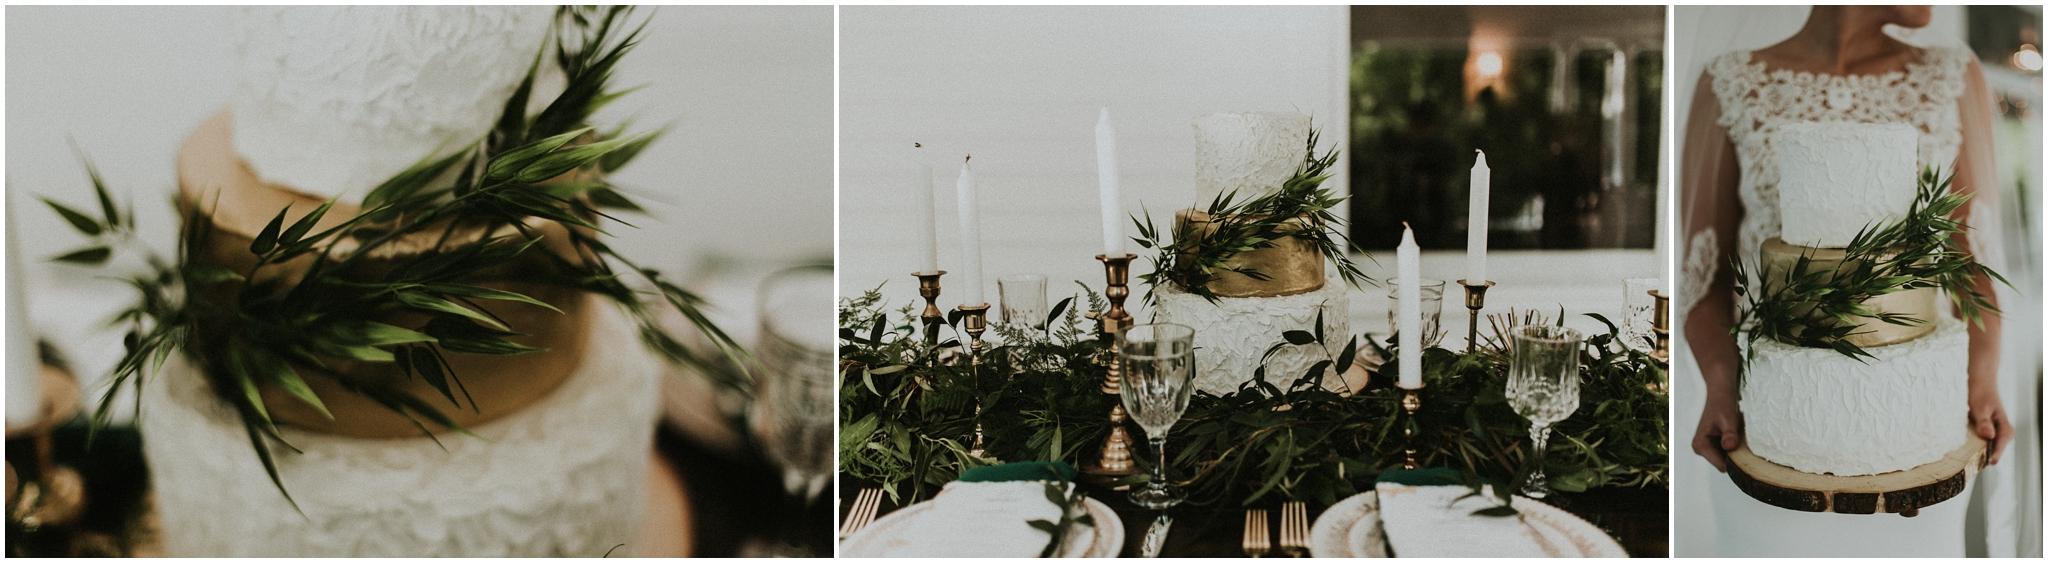 Wedding-photographer-ritchie-hill_0016.jpg